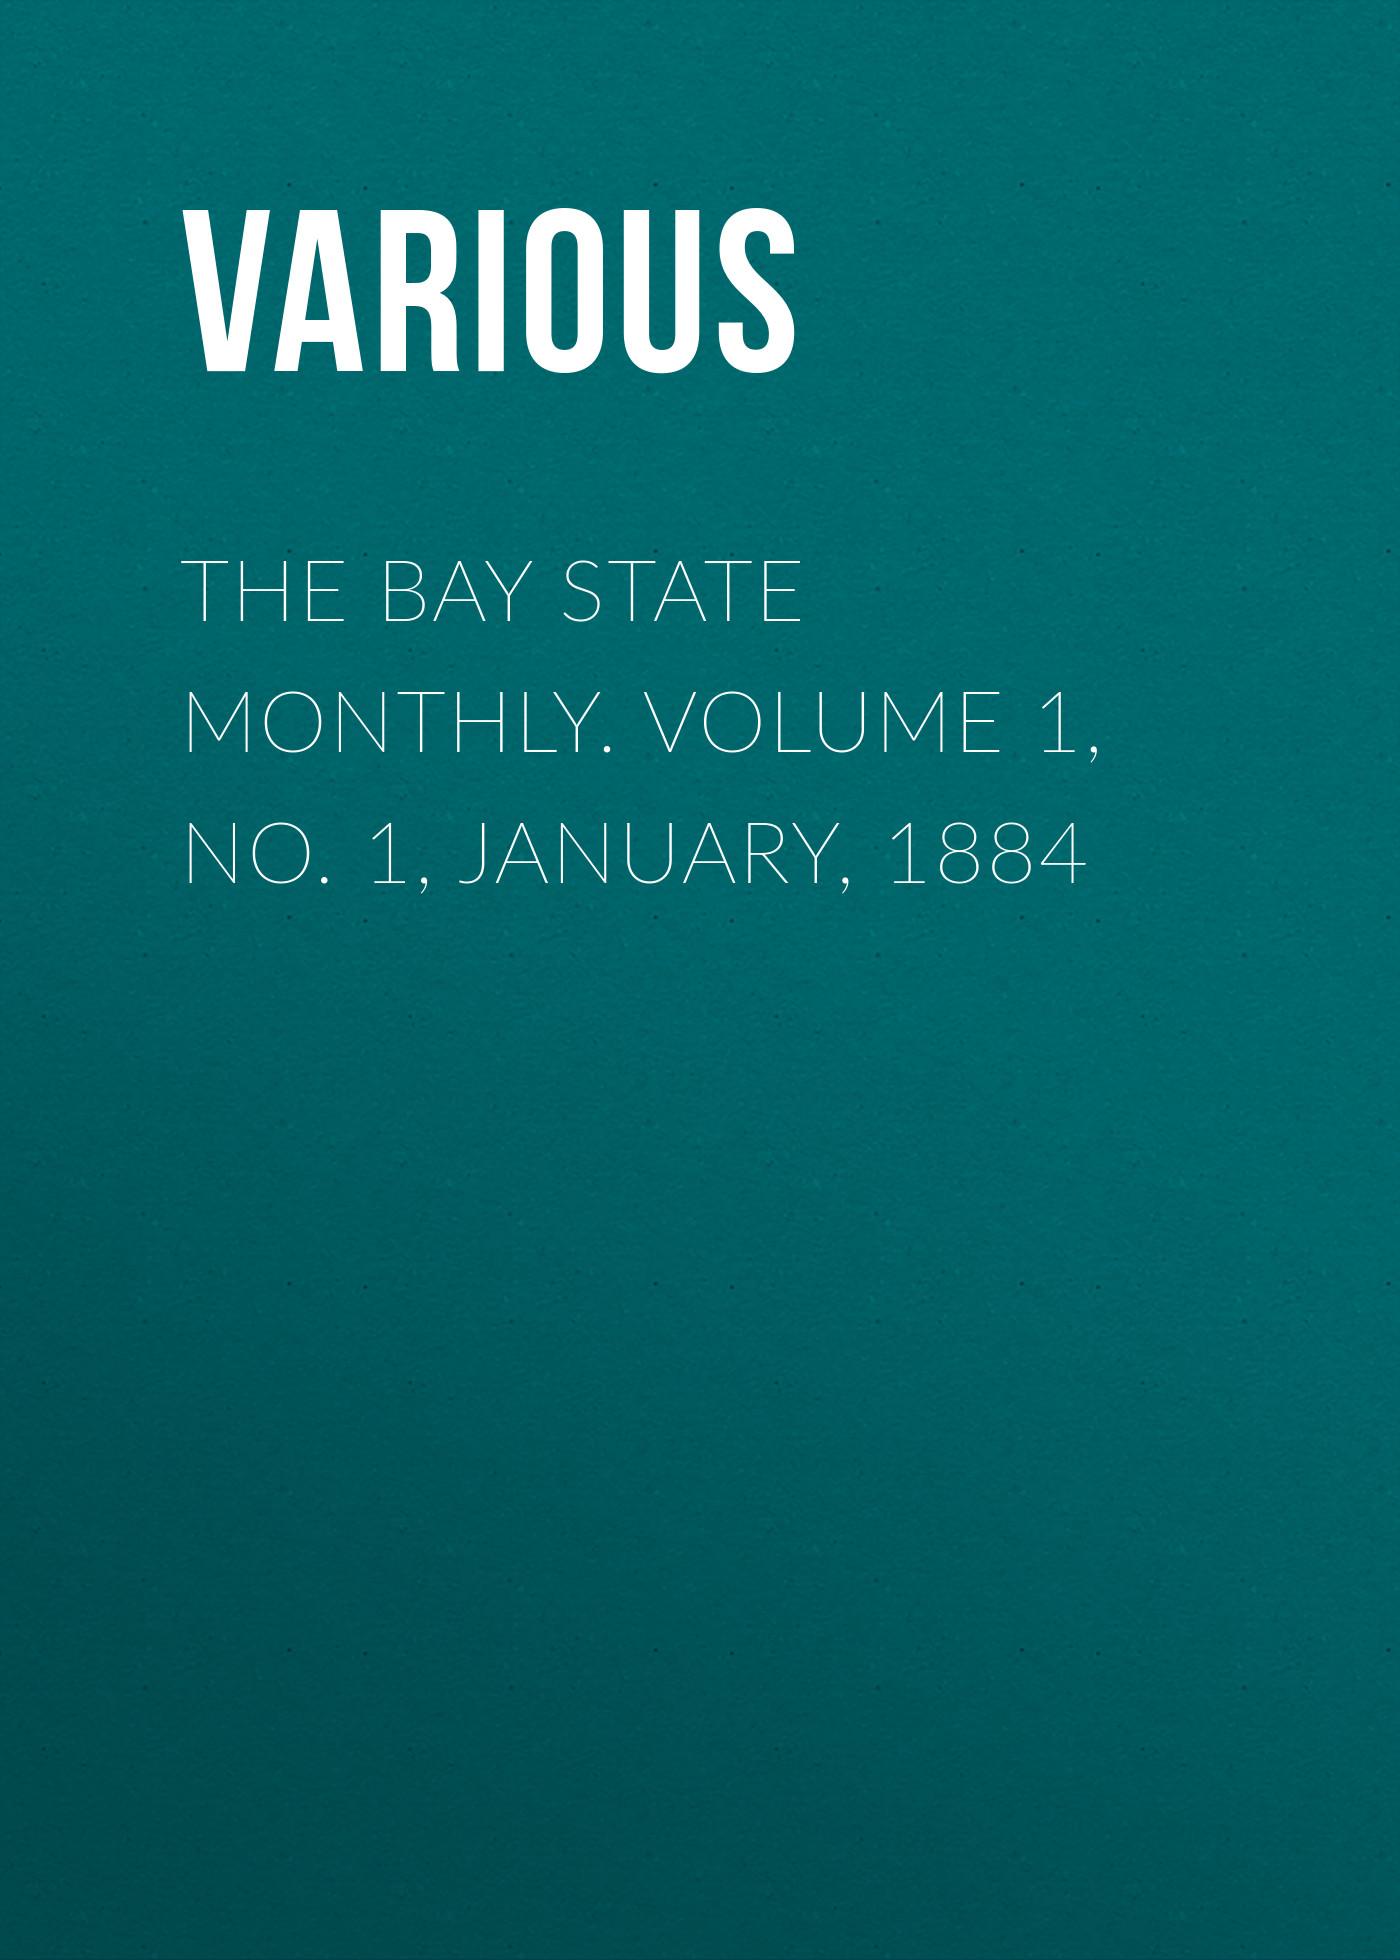 лучшая цена Various The Bay State Monthly. Volume 1, No. 1, January, 1884